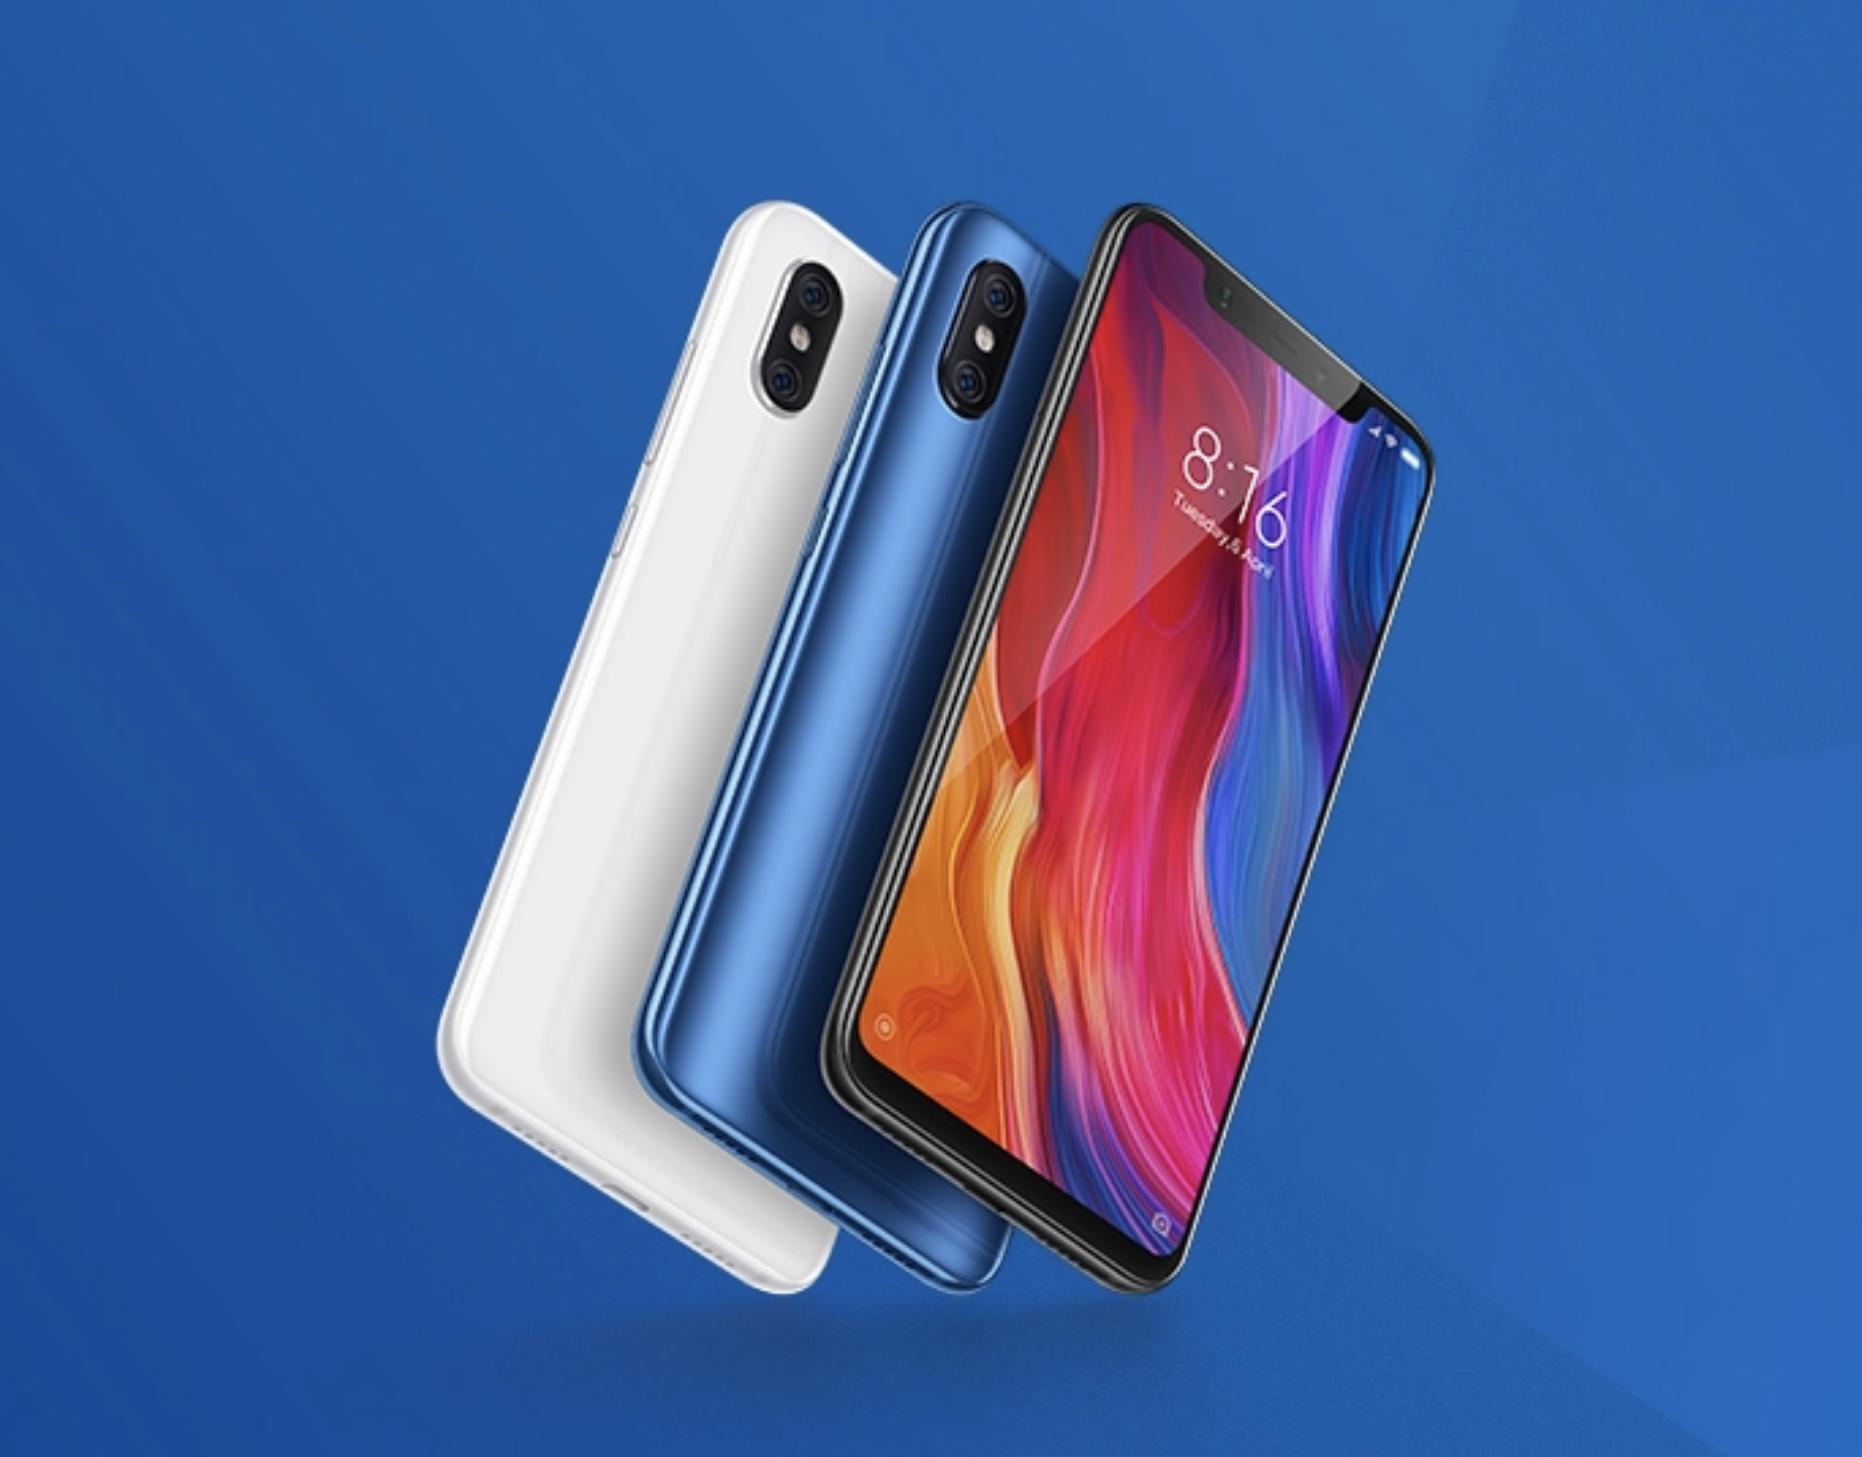 Xiaomi Mi 8 arriva in Italia da oggi a partire da 529,90€